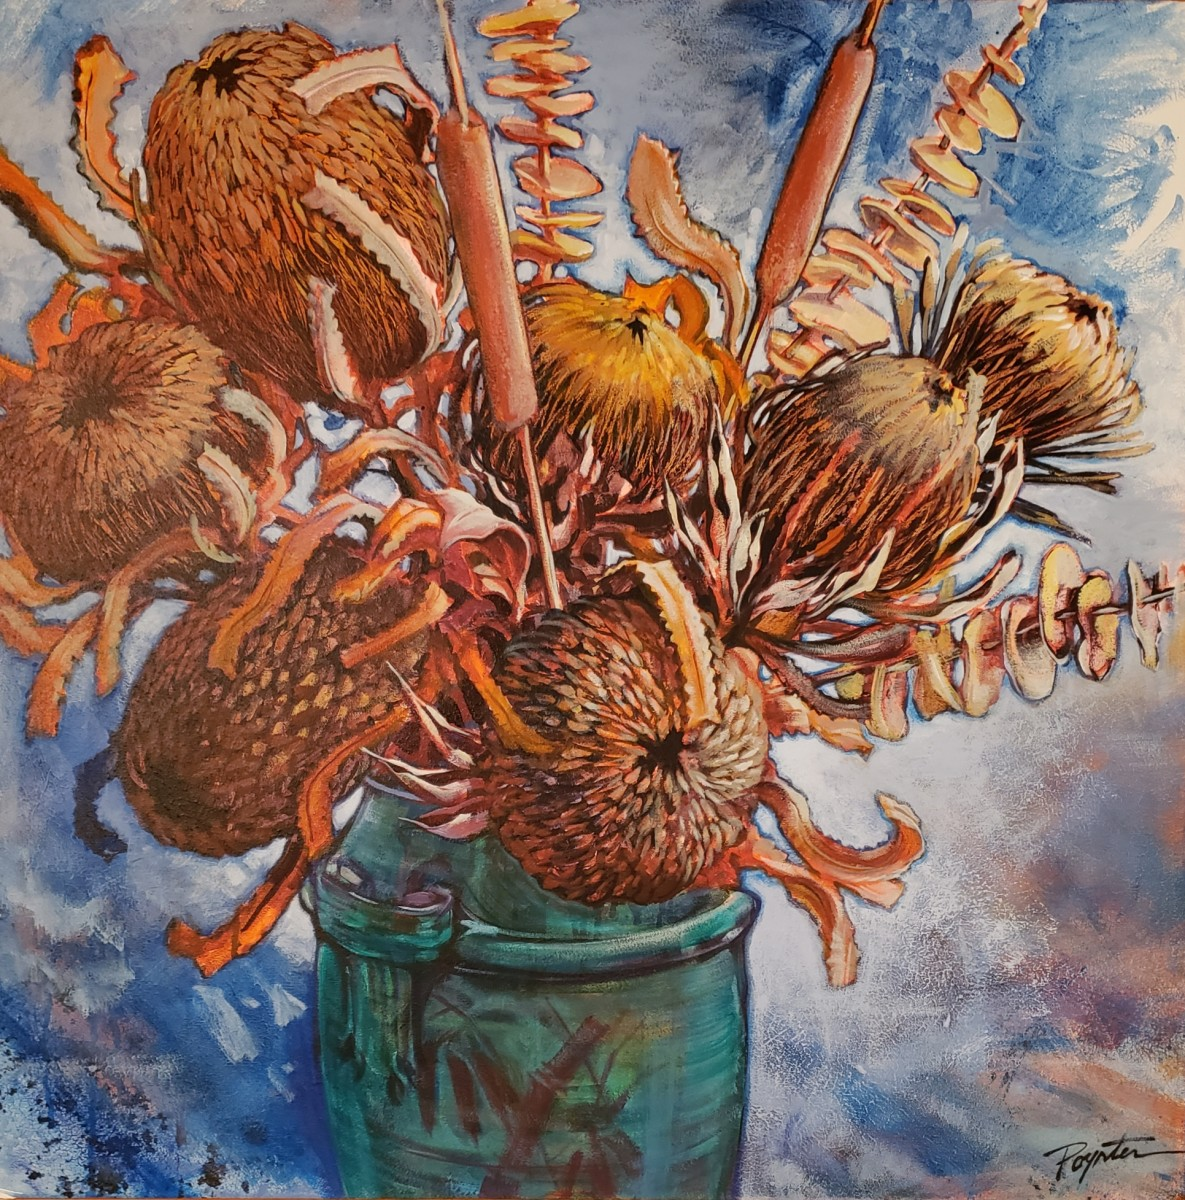 Banksia, Protea & Pottery #1# by Jan Poynter